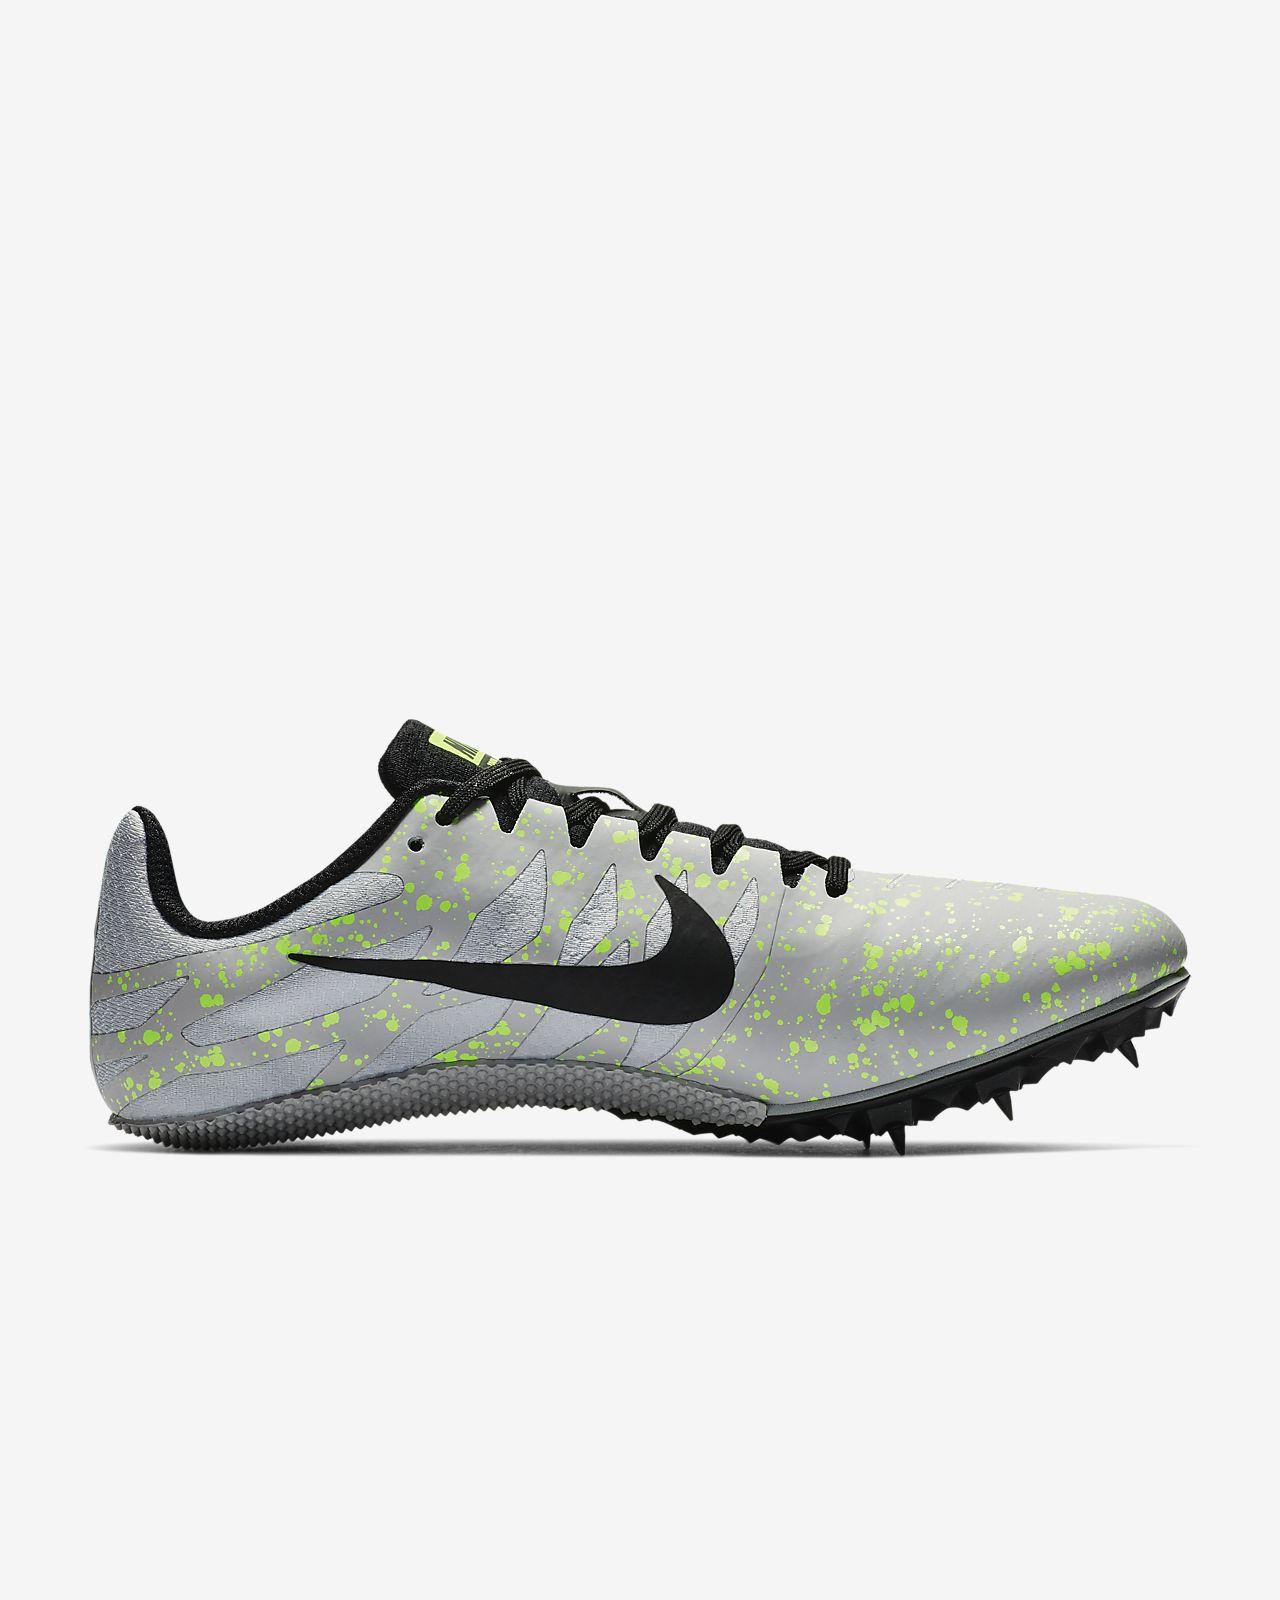 9 Zoom Unisex Atletismo Calzado Clavos Mx Nike De Rival S Con w4qq57z